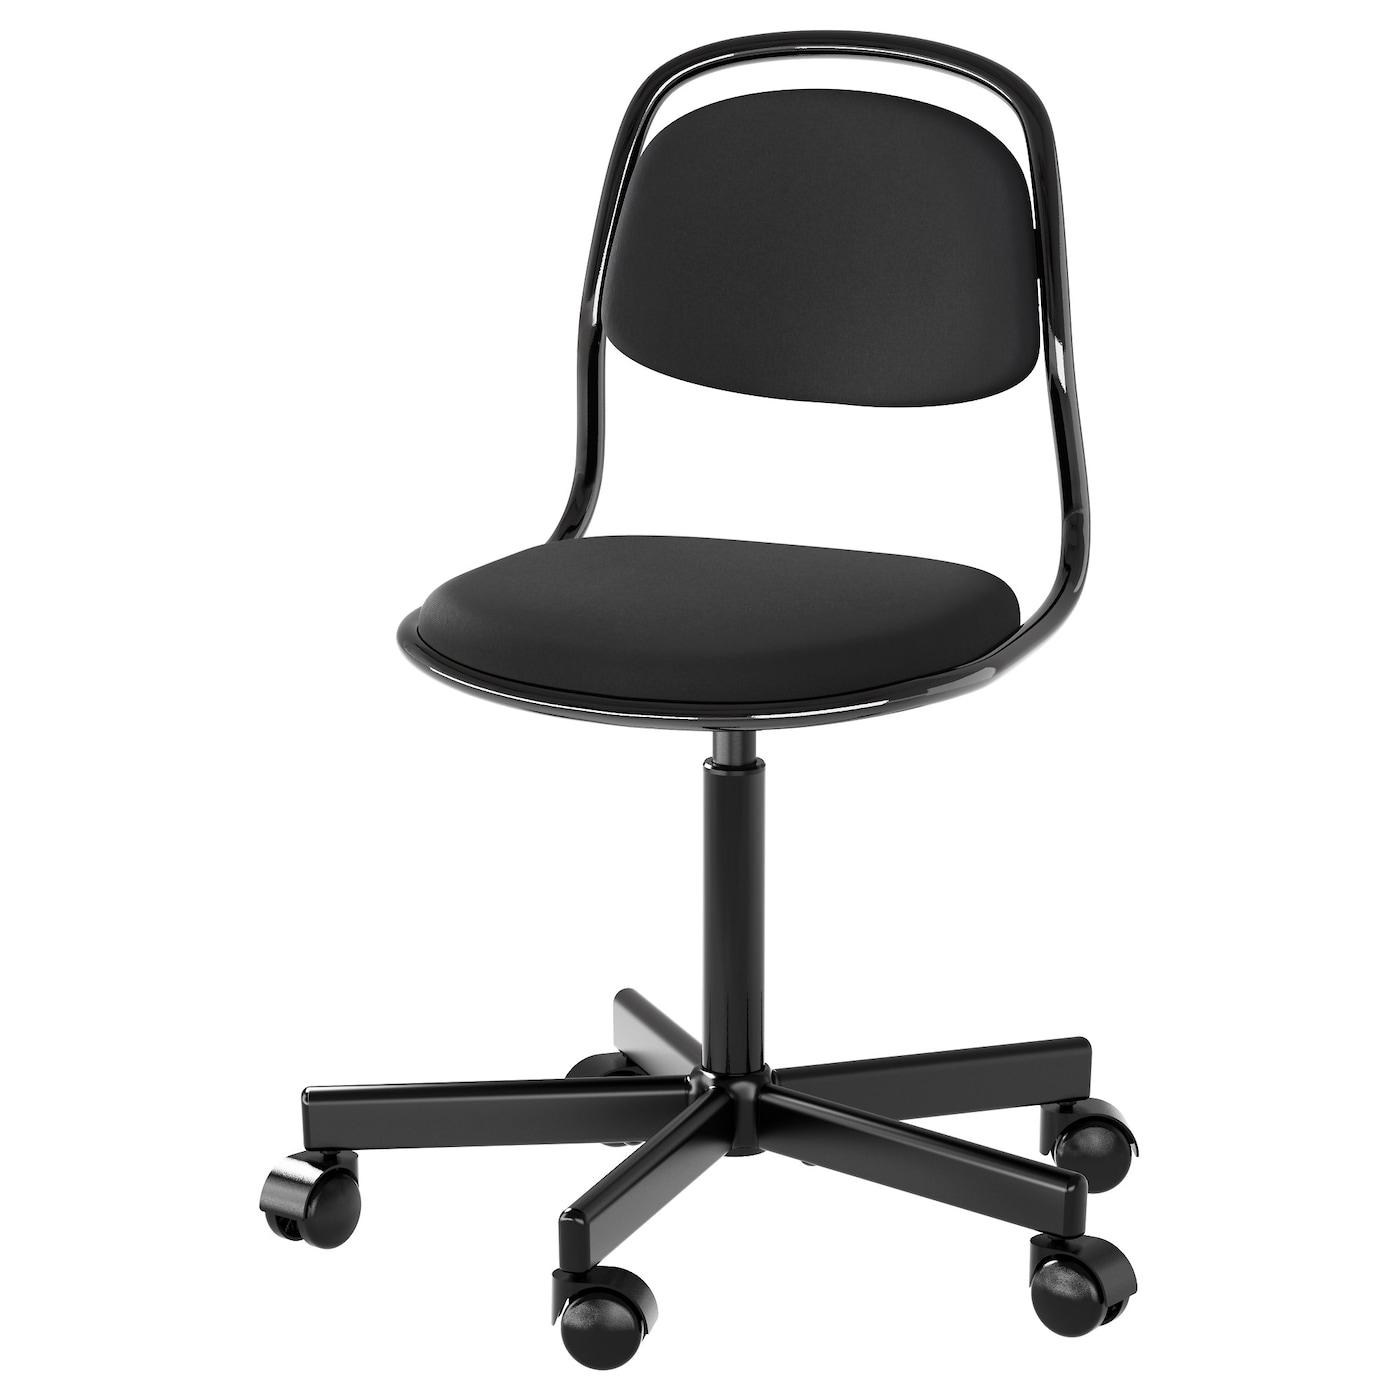 Childrens Desks Chairs 8 to 12 IKEA